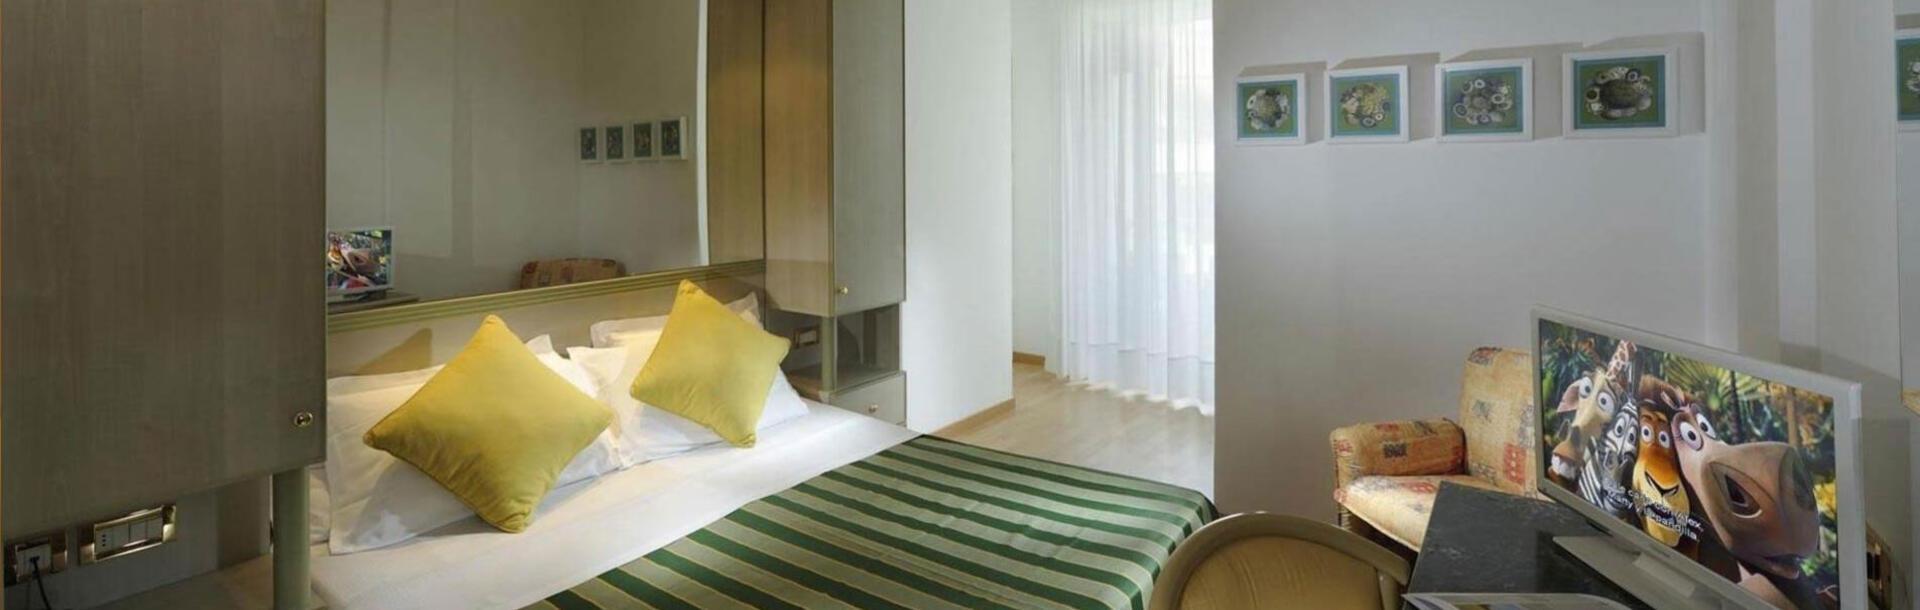 hotel-montecarlo it camera-standard 013